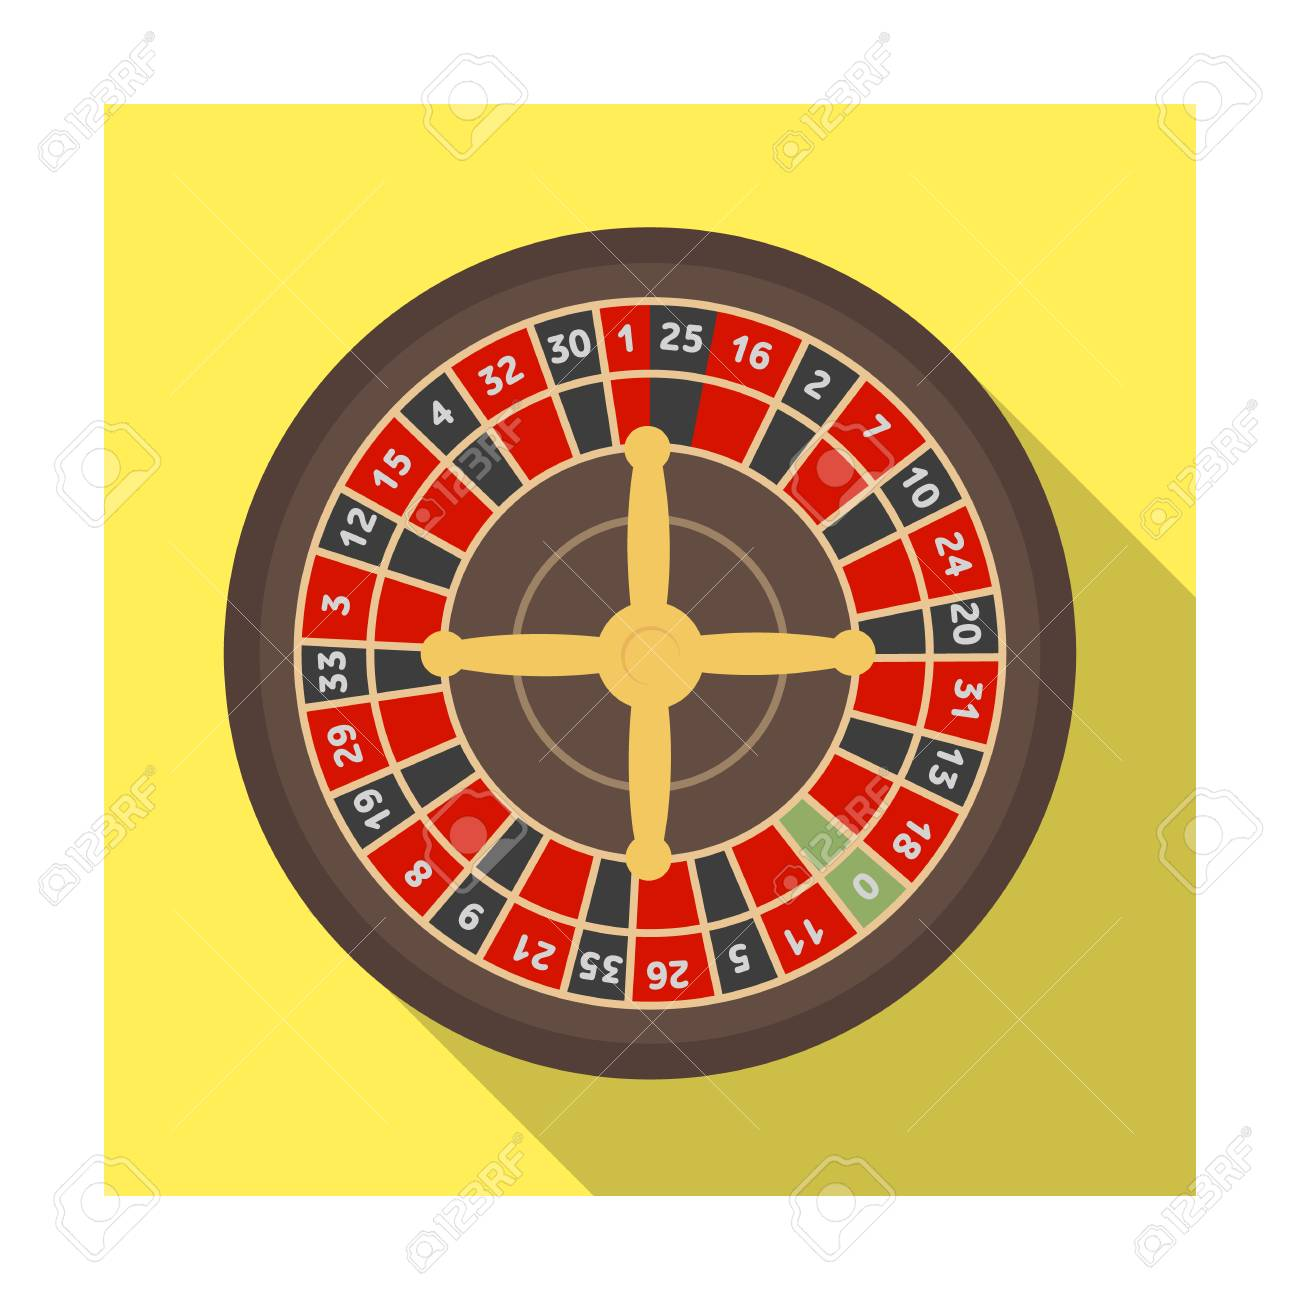 Most popular casino game gamble book